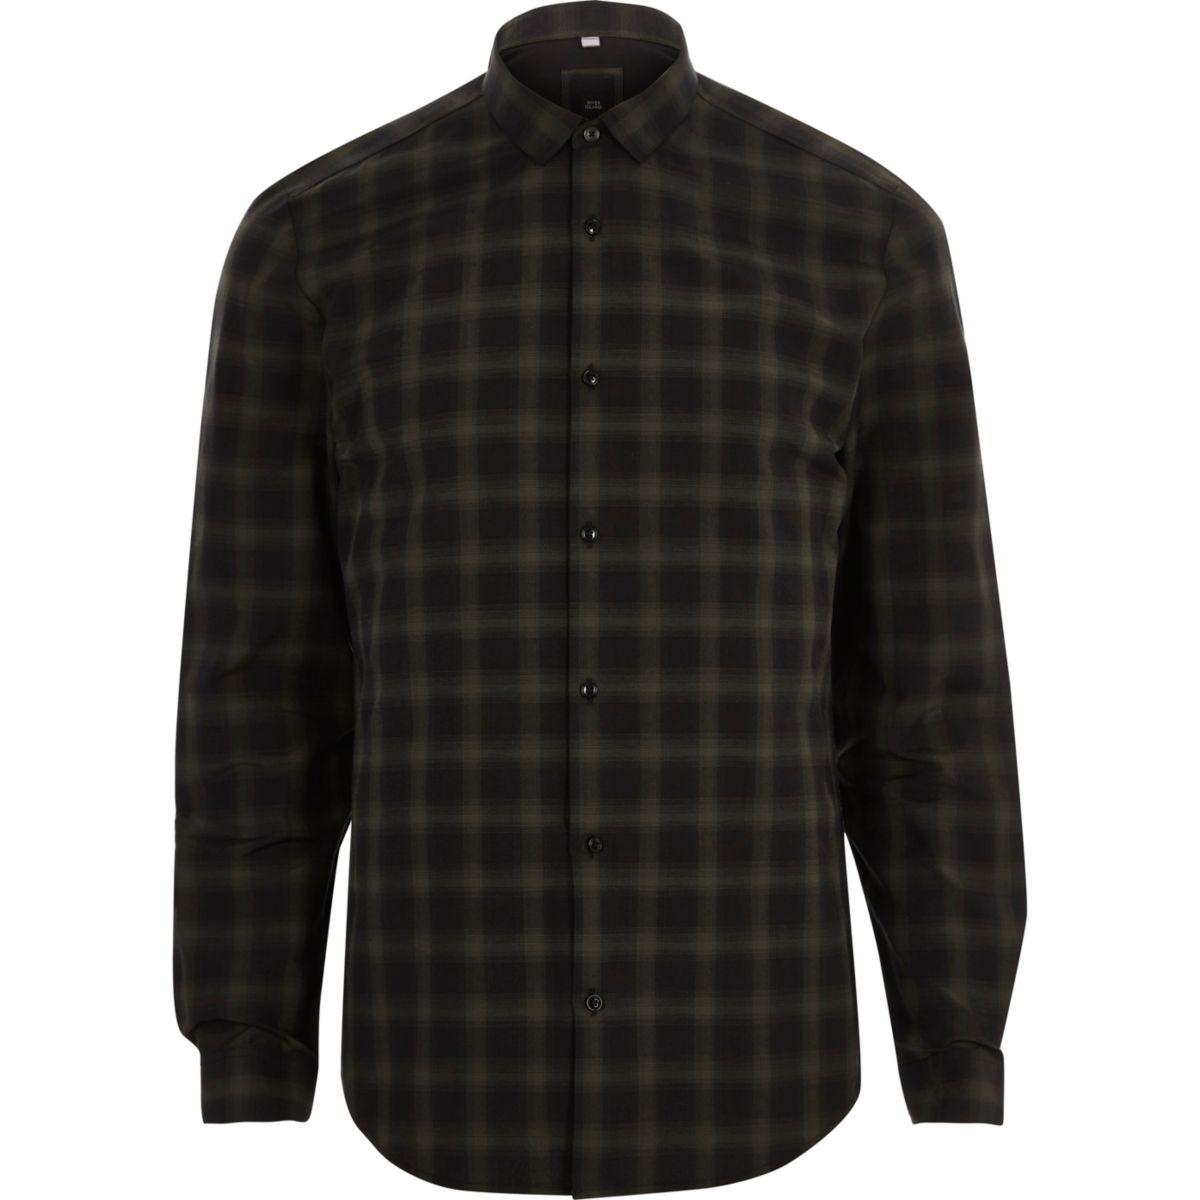 Dark green long sleeve slim fit shirt